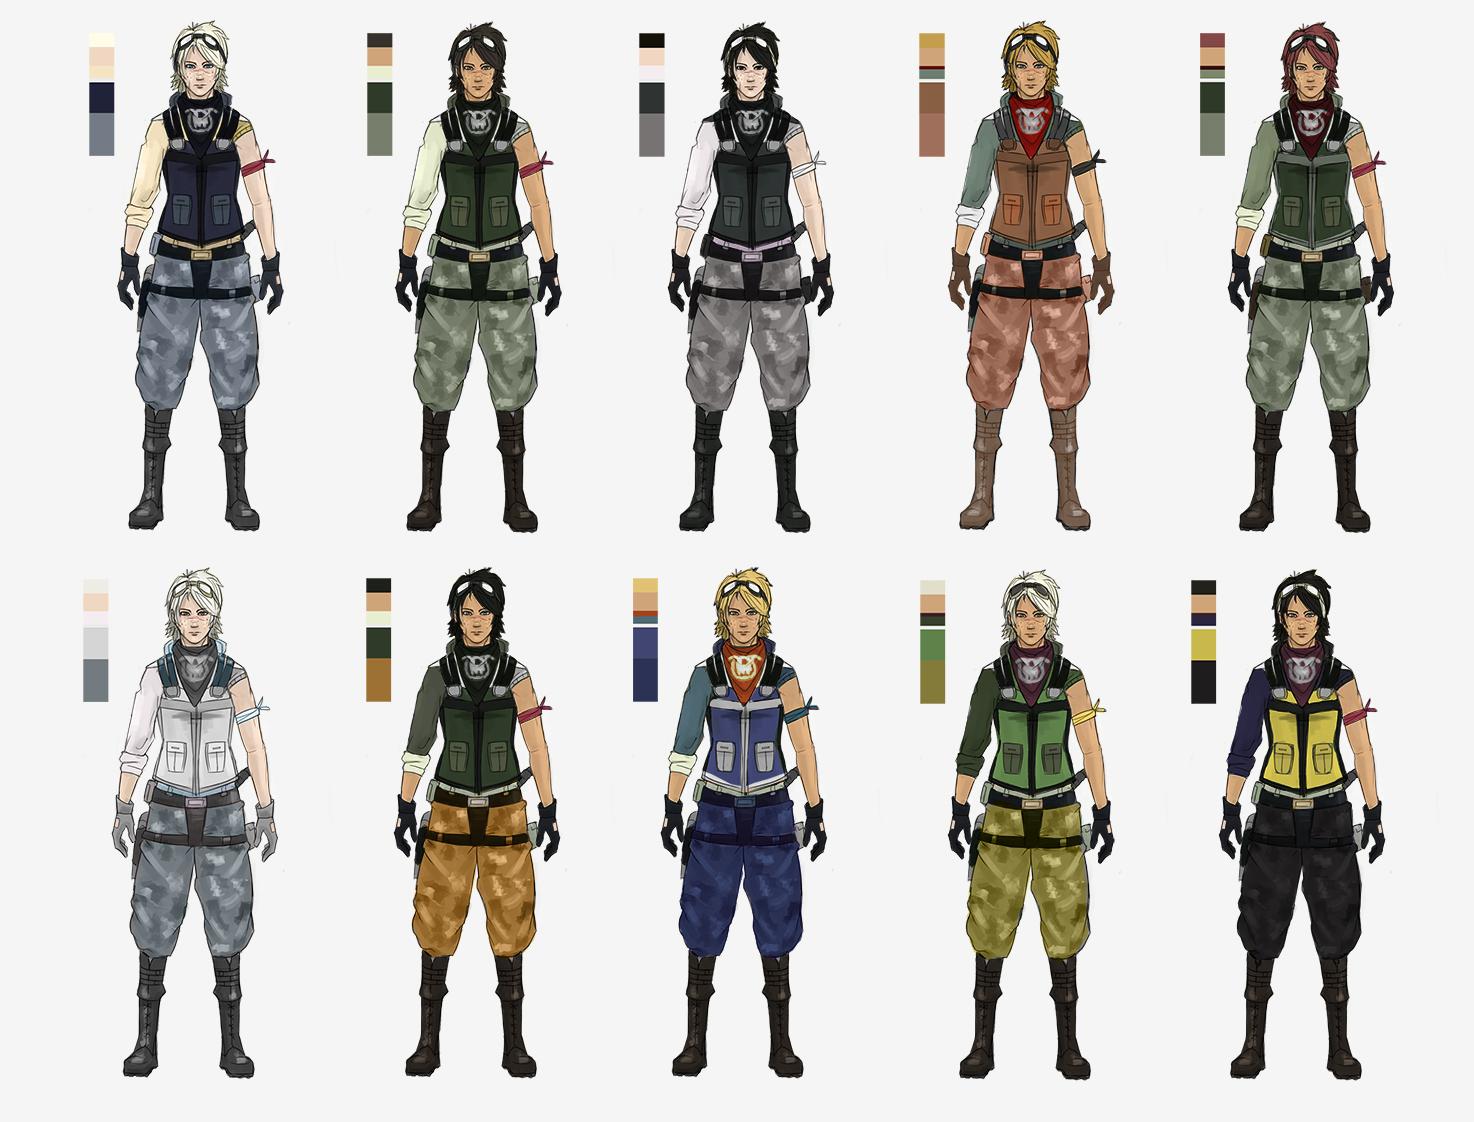 Character Design Colour Palette : Character color schemes by kaisercvr on deviantart